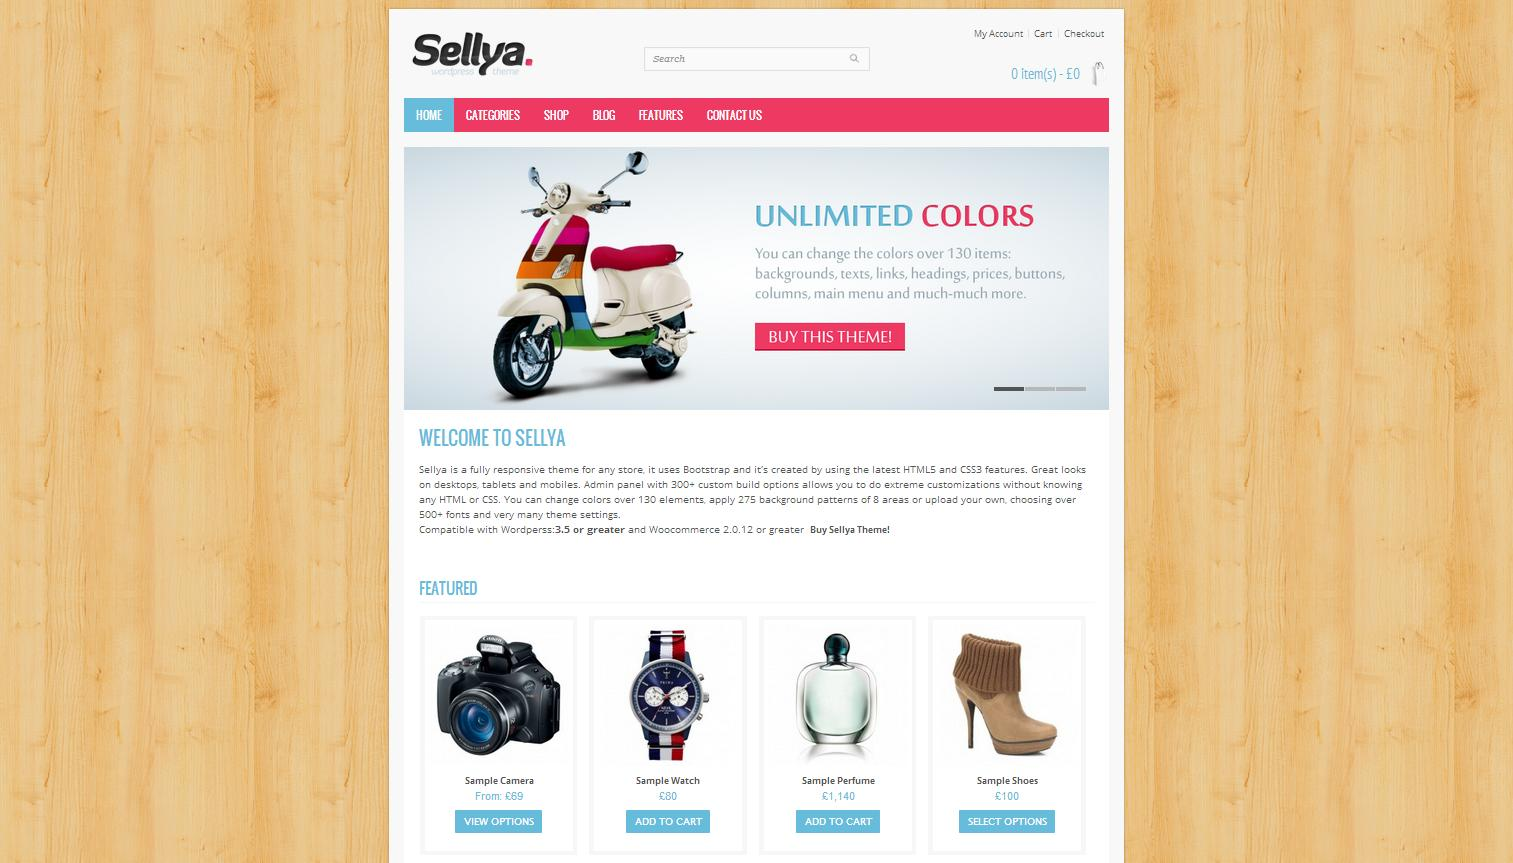 Sellya - Responsive WooCommerce Theme - Premium wordpress themes Ecommerce>WooCommerce